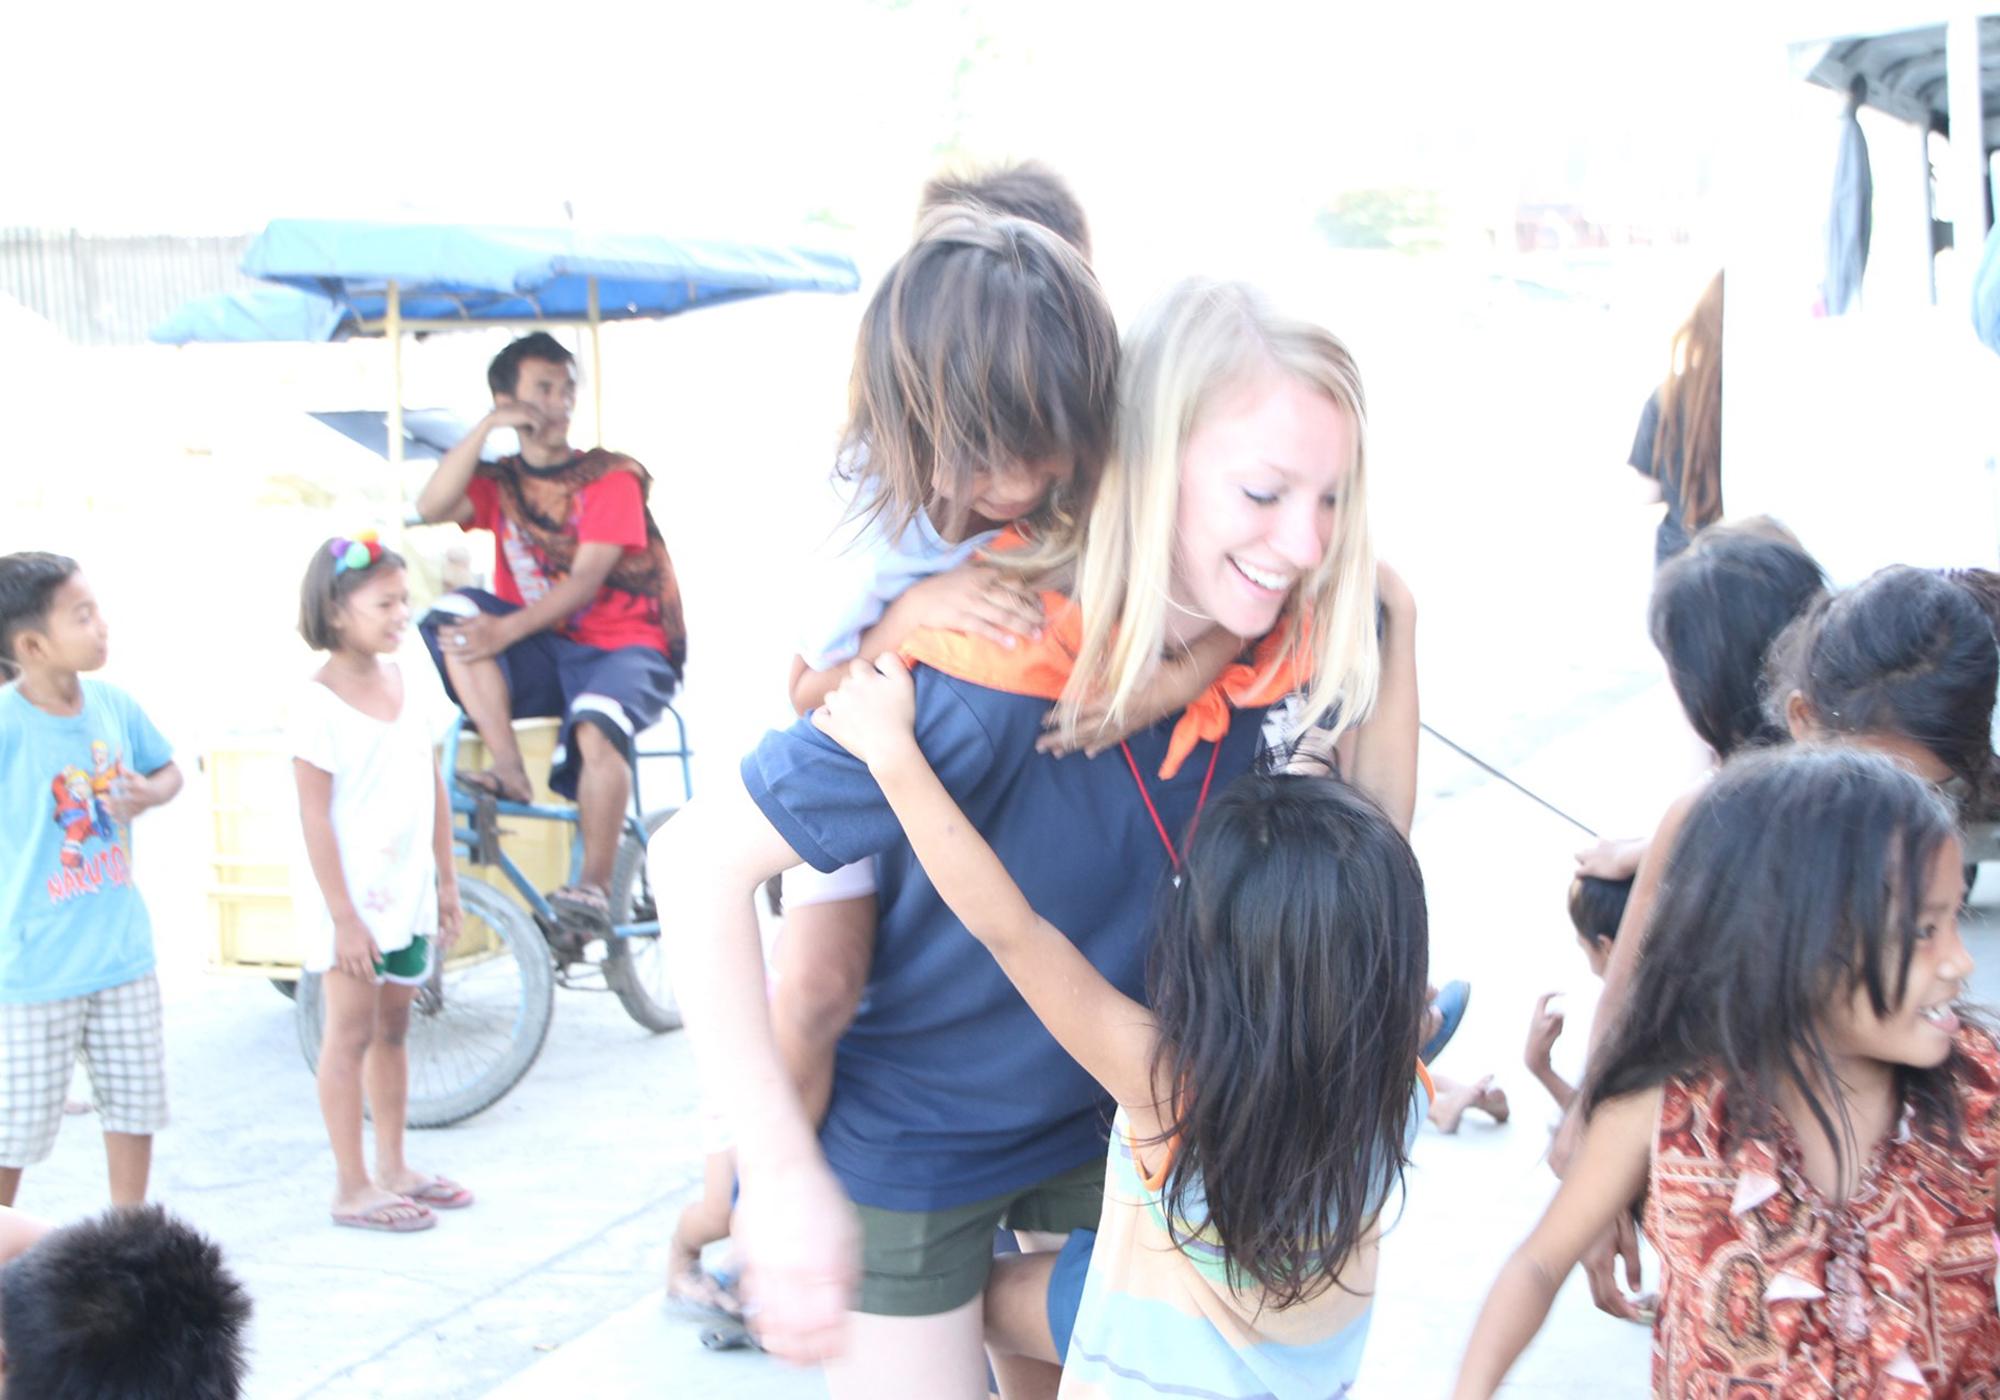 Feeding & playing with street children